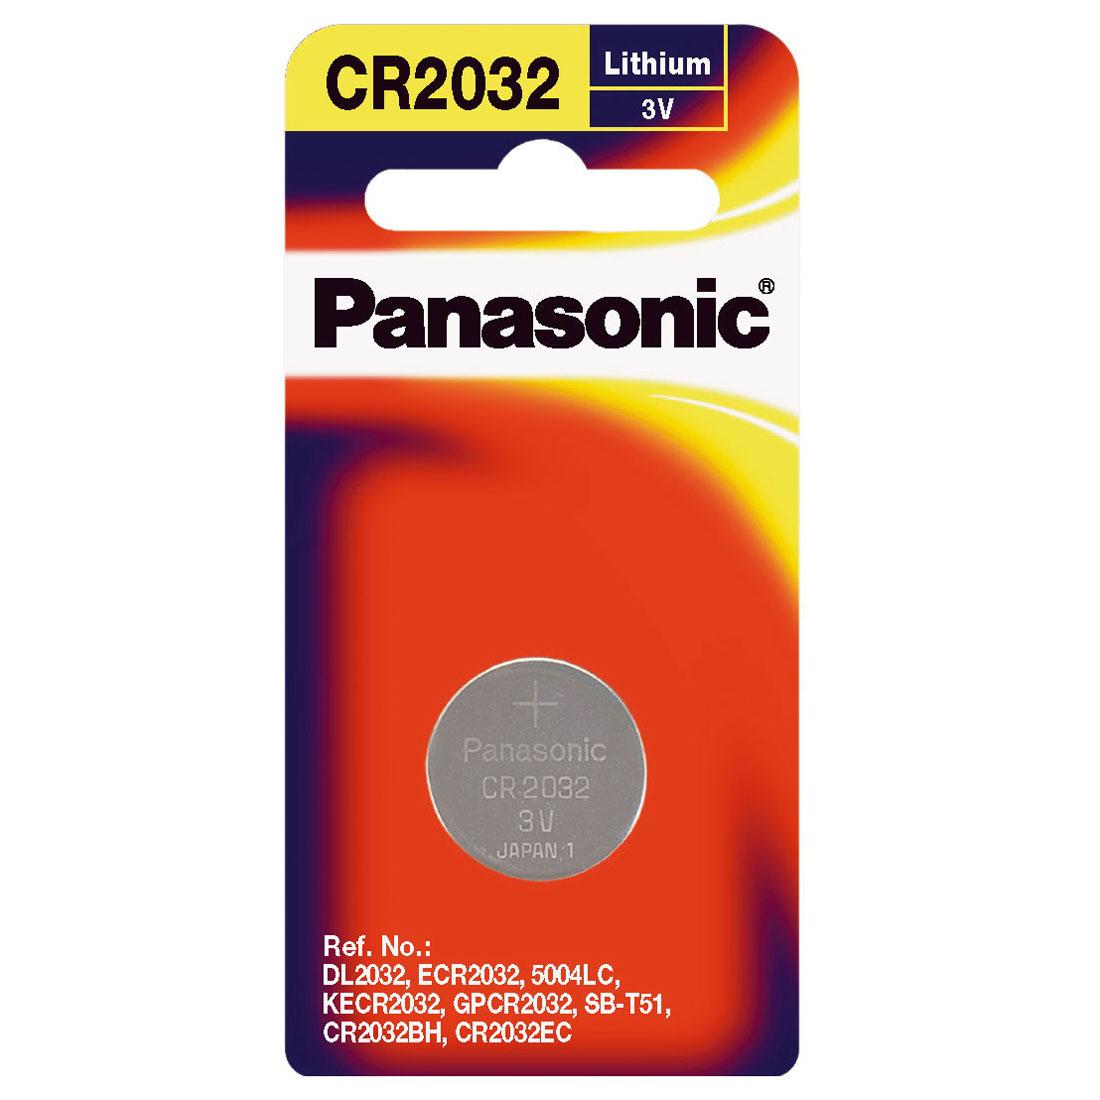 3V 225mAh Lithium Coin Battery